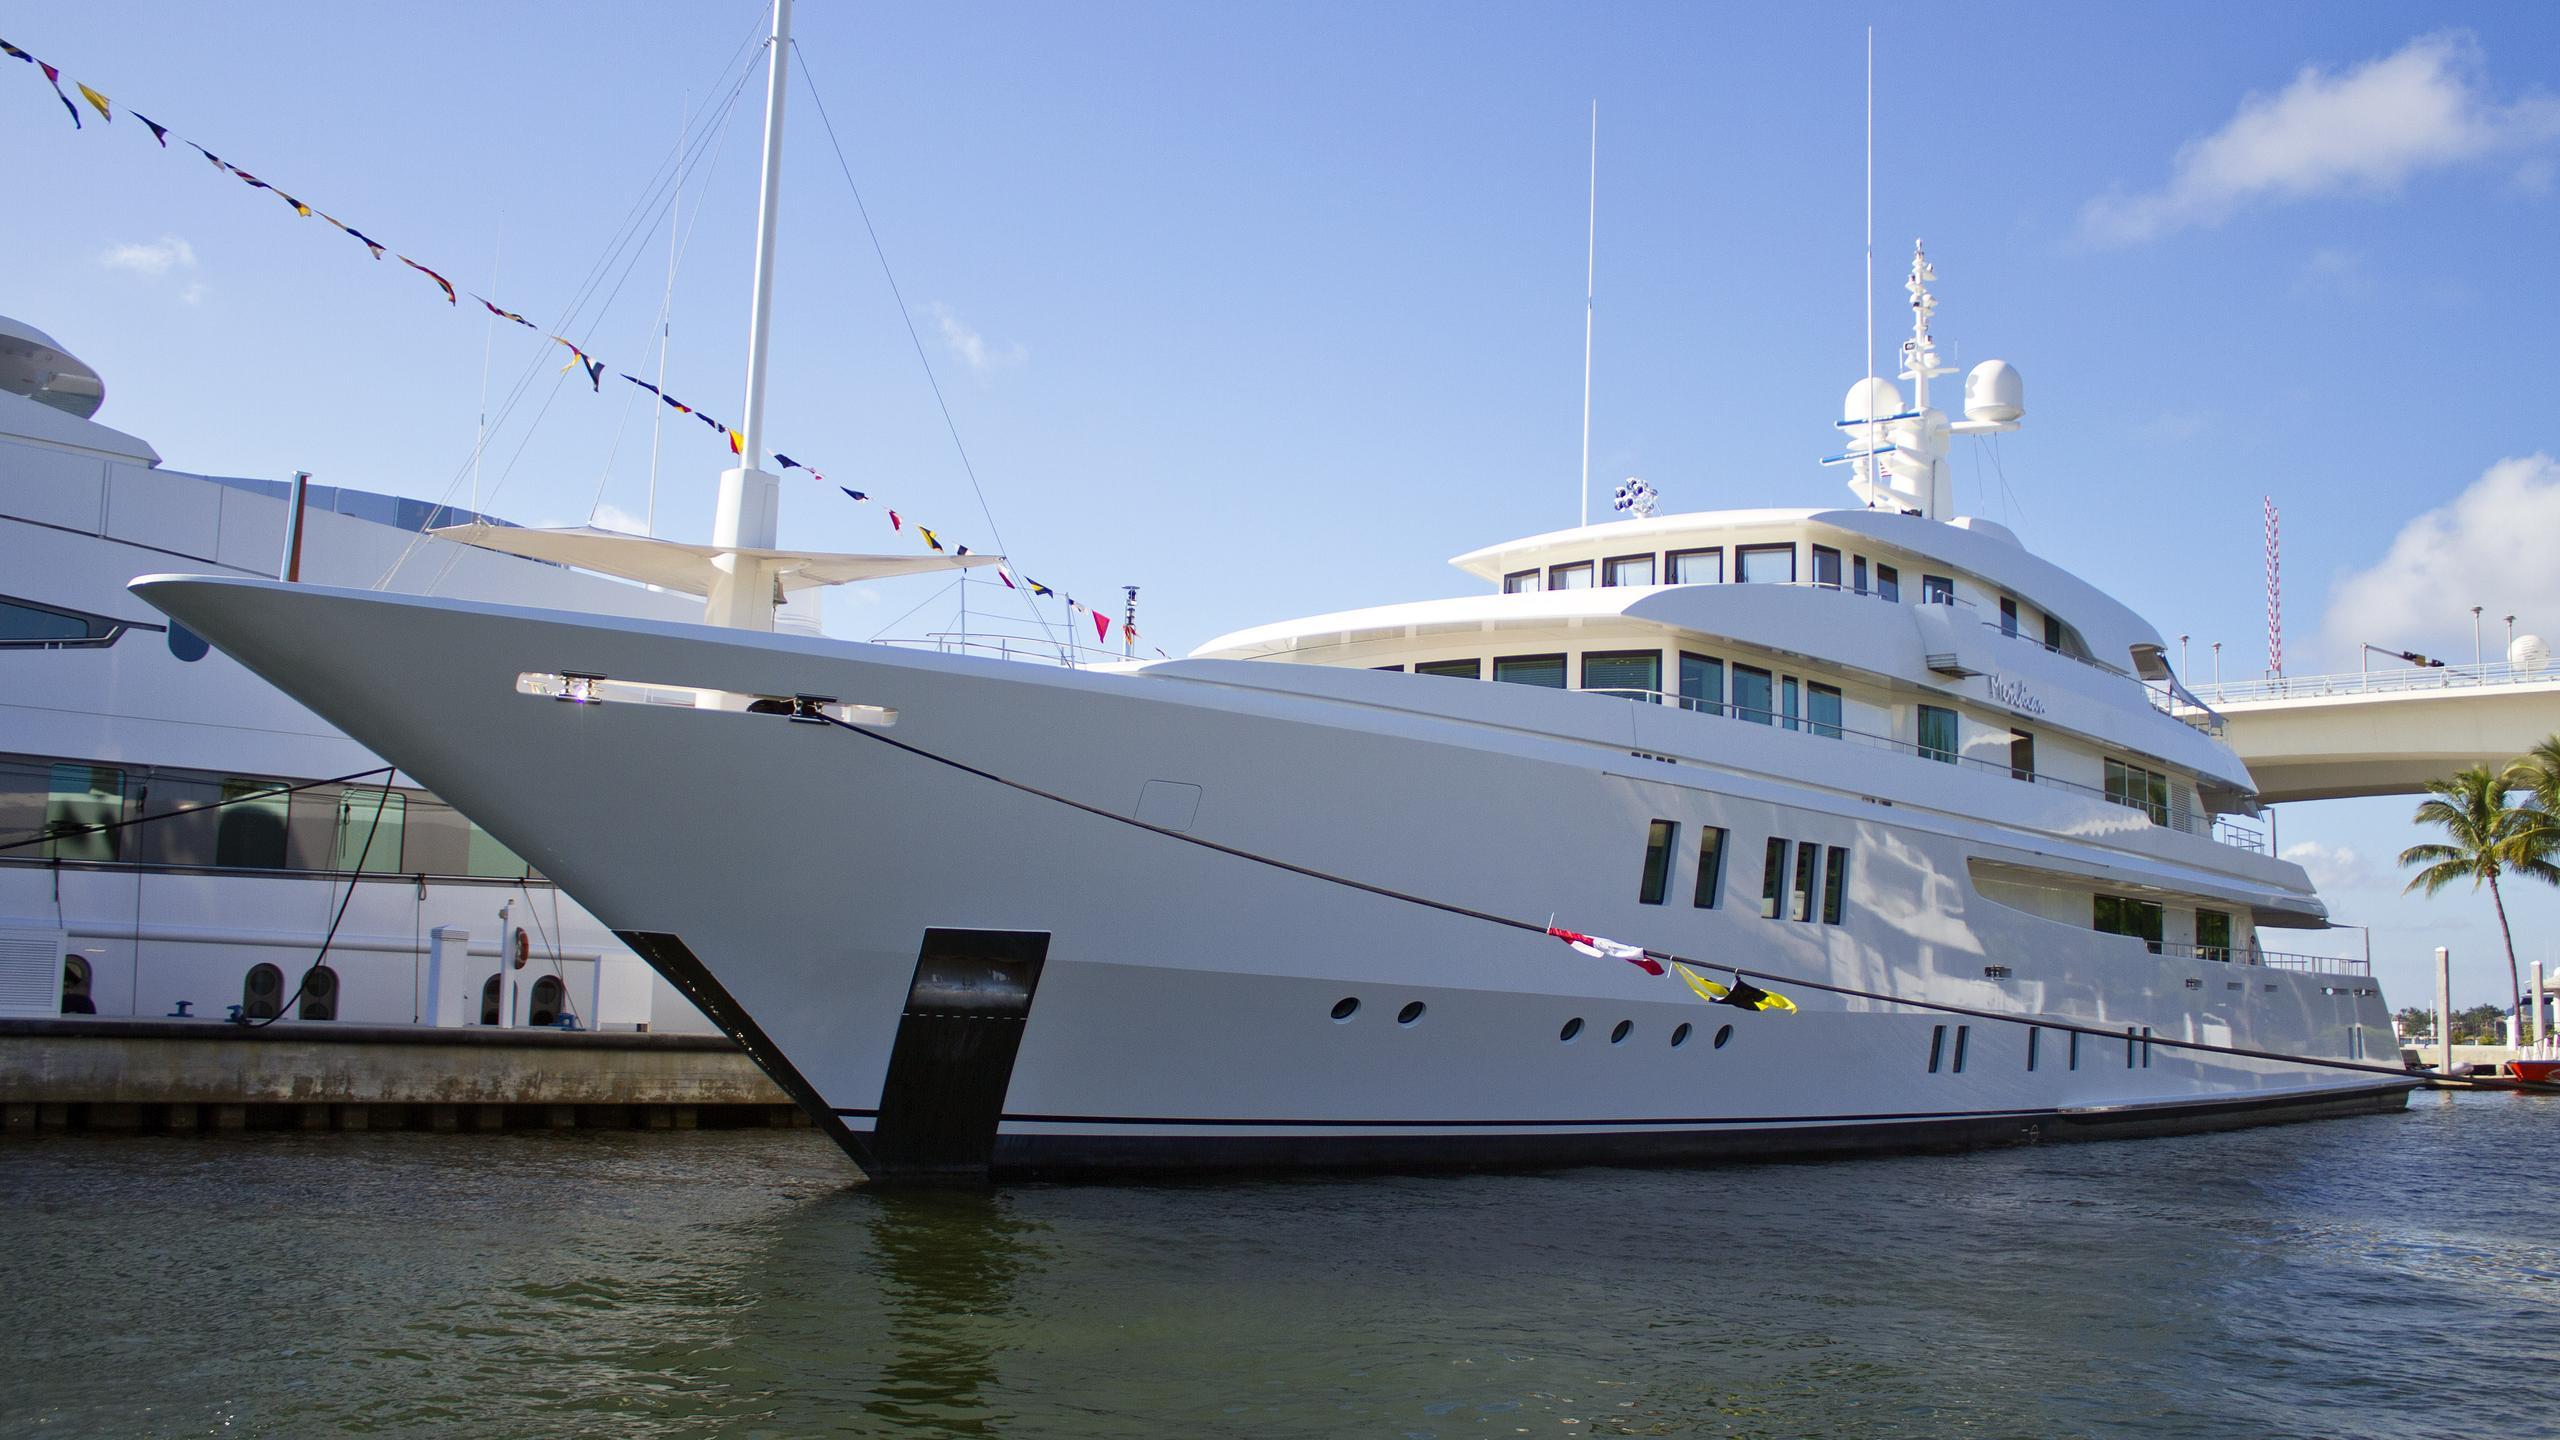 meridian-motor-yacht-icon-62-2012-63m-half-profile